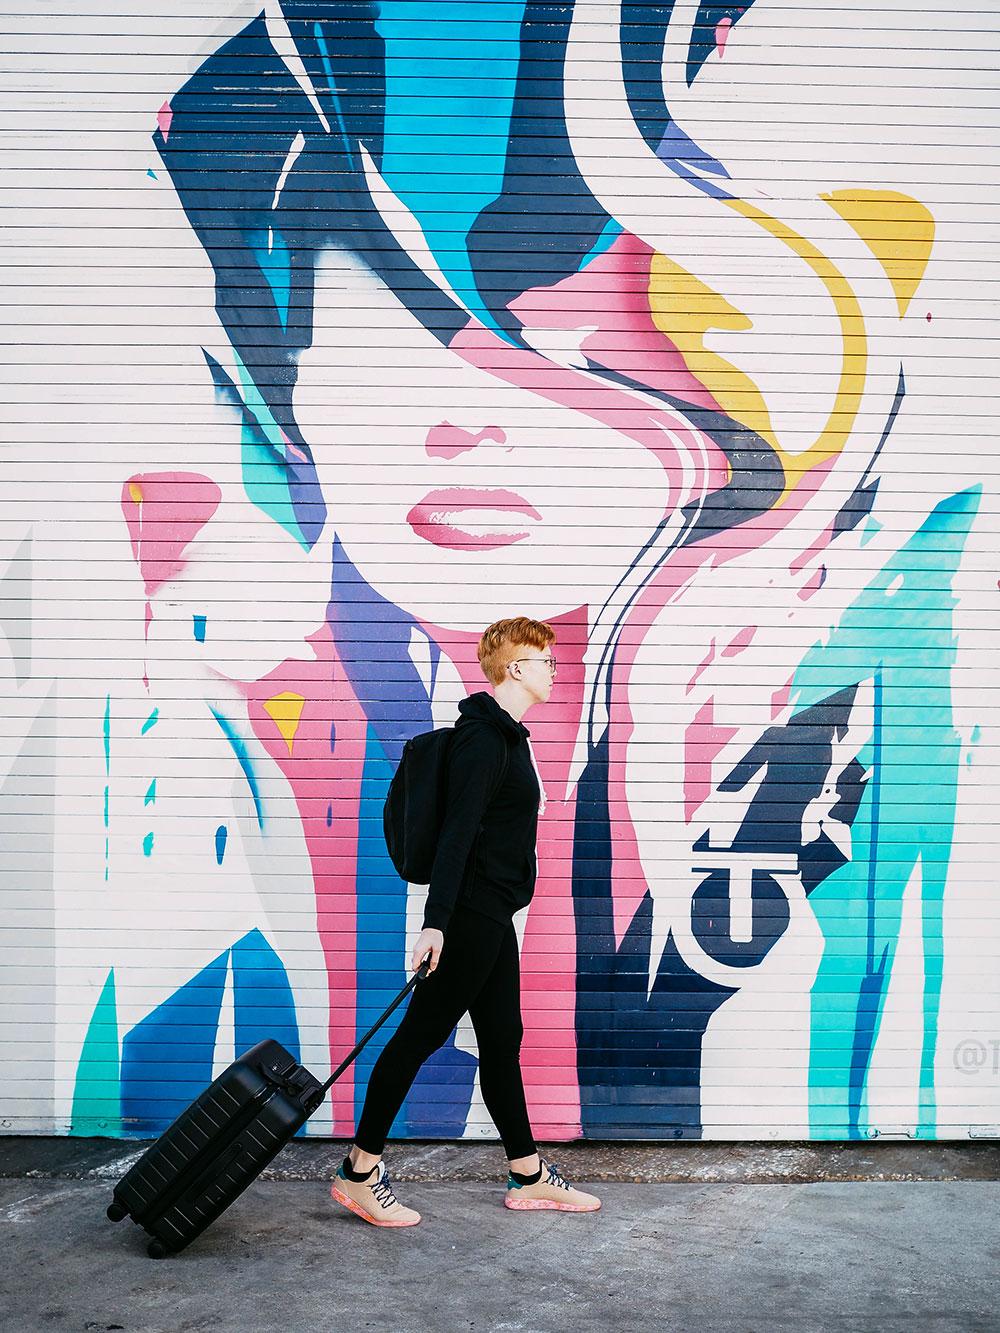 دیوارنگاری یا گرافیتی